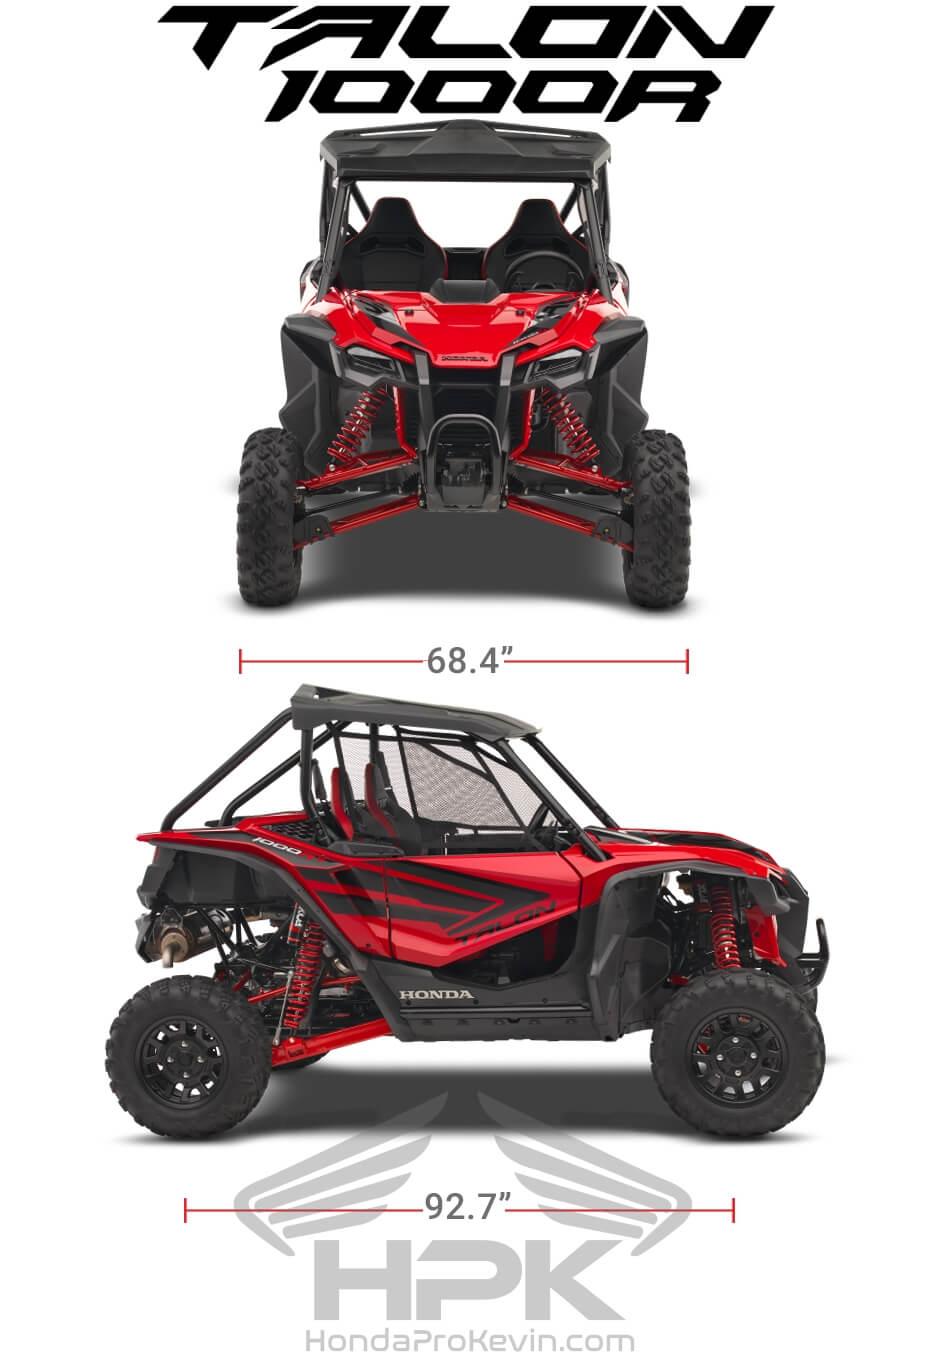 Honda TALON 1000R Dimensions: Width, Length, Wheelbase Specs | TALON 1000 R Sport SxS / UTV / Side by Side ATV